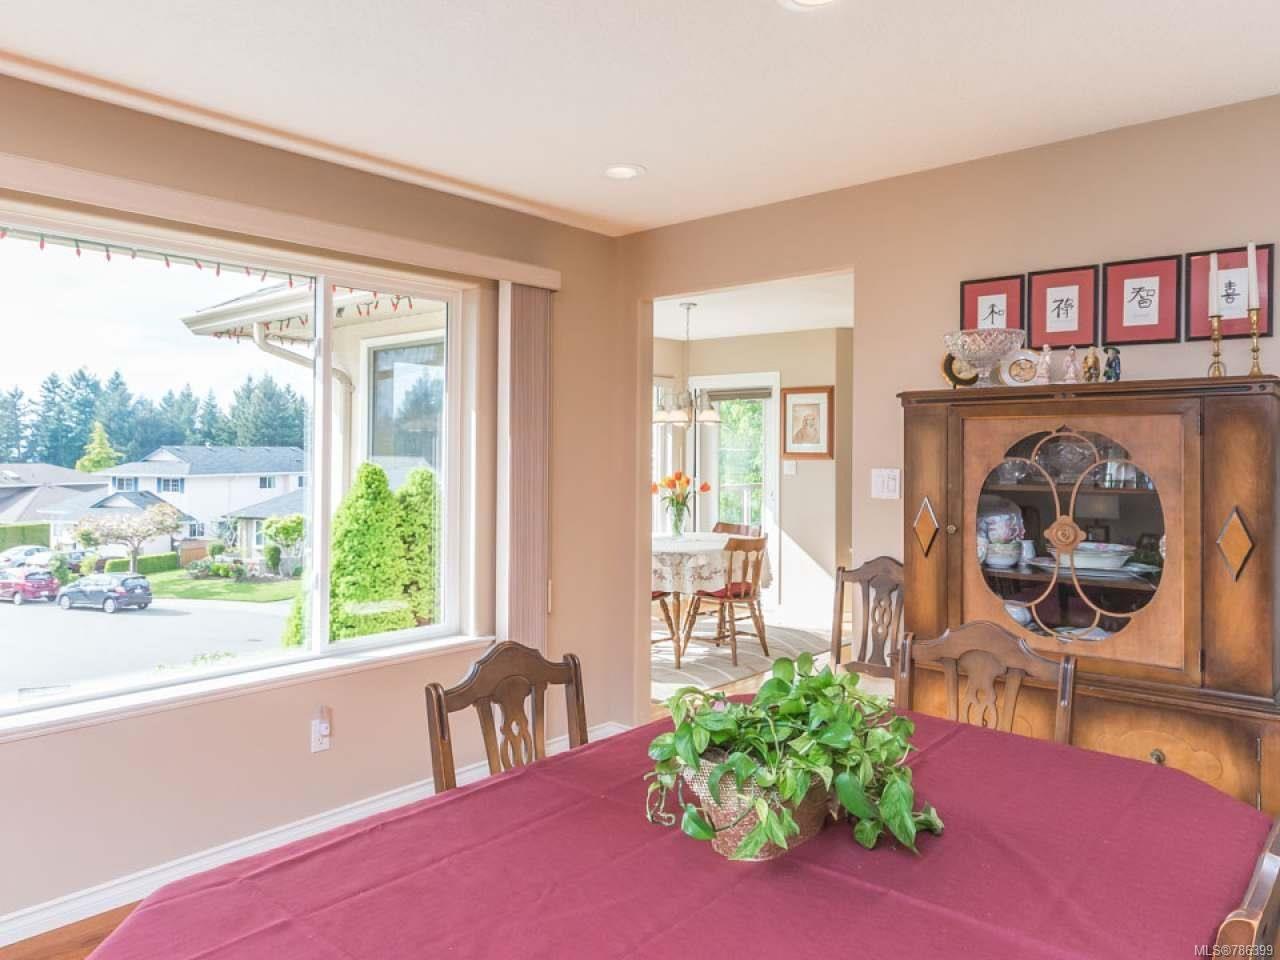 Photo 18: Photos: 5371 HIGHRIDGE PLACE in NANAIMO: Na North Nanaimo House for sale (Nanaimo)  : MLS®# 786399